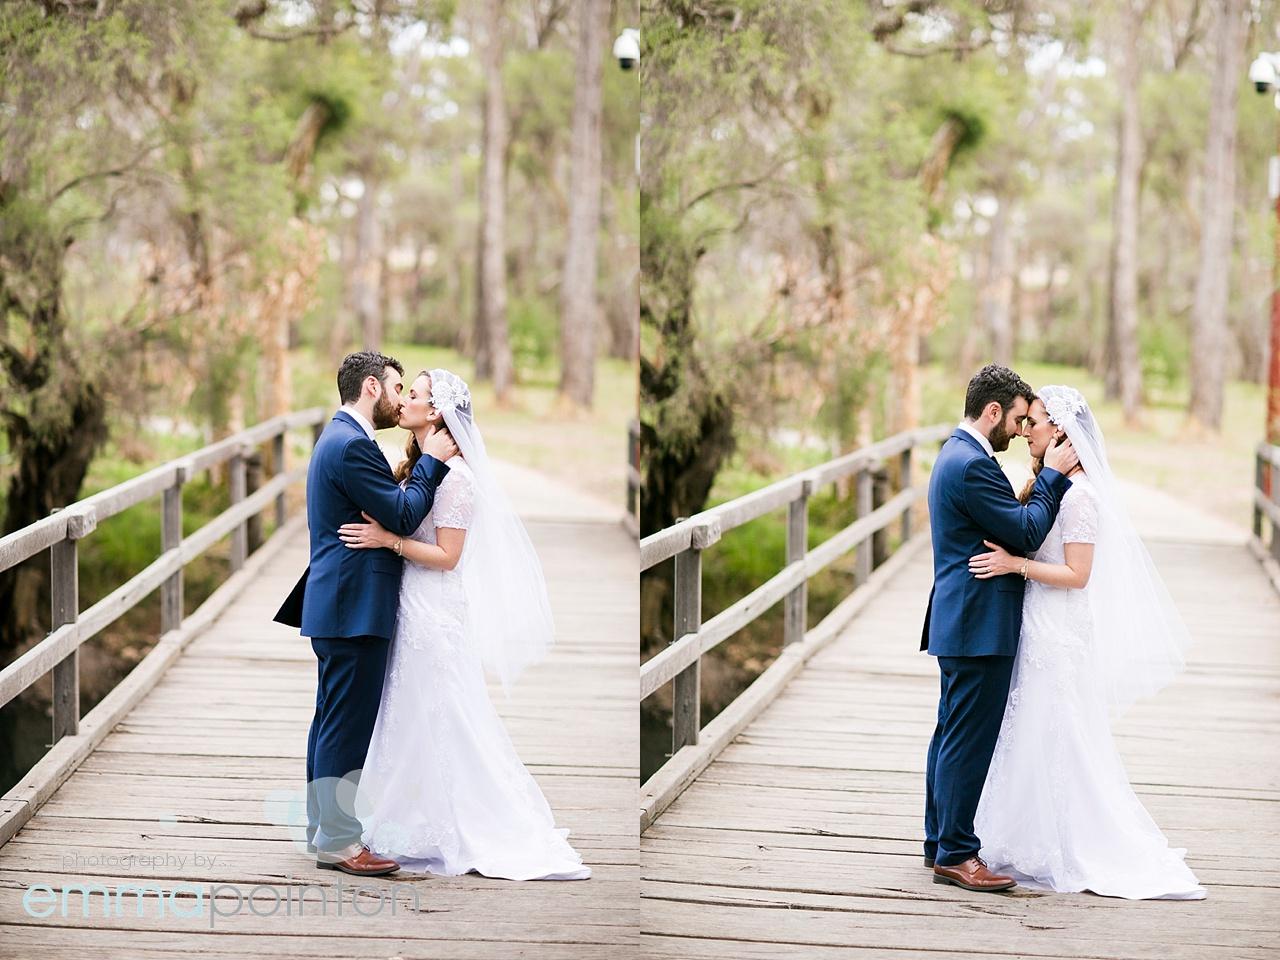 Perth Wedding Photography 076.jpg